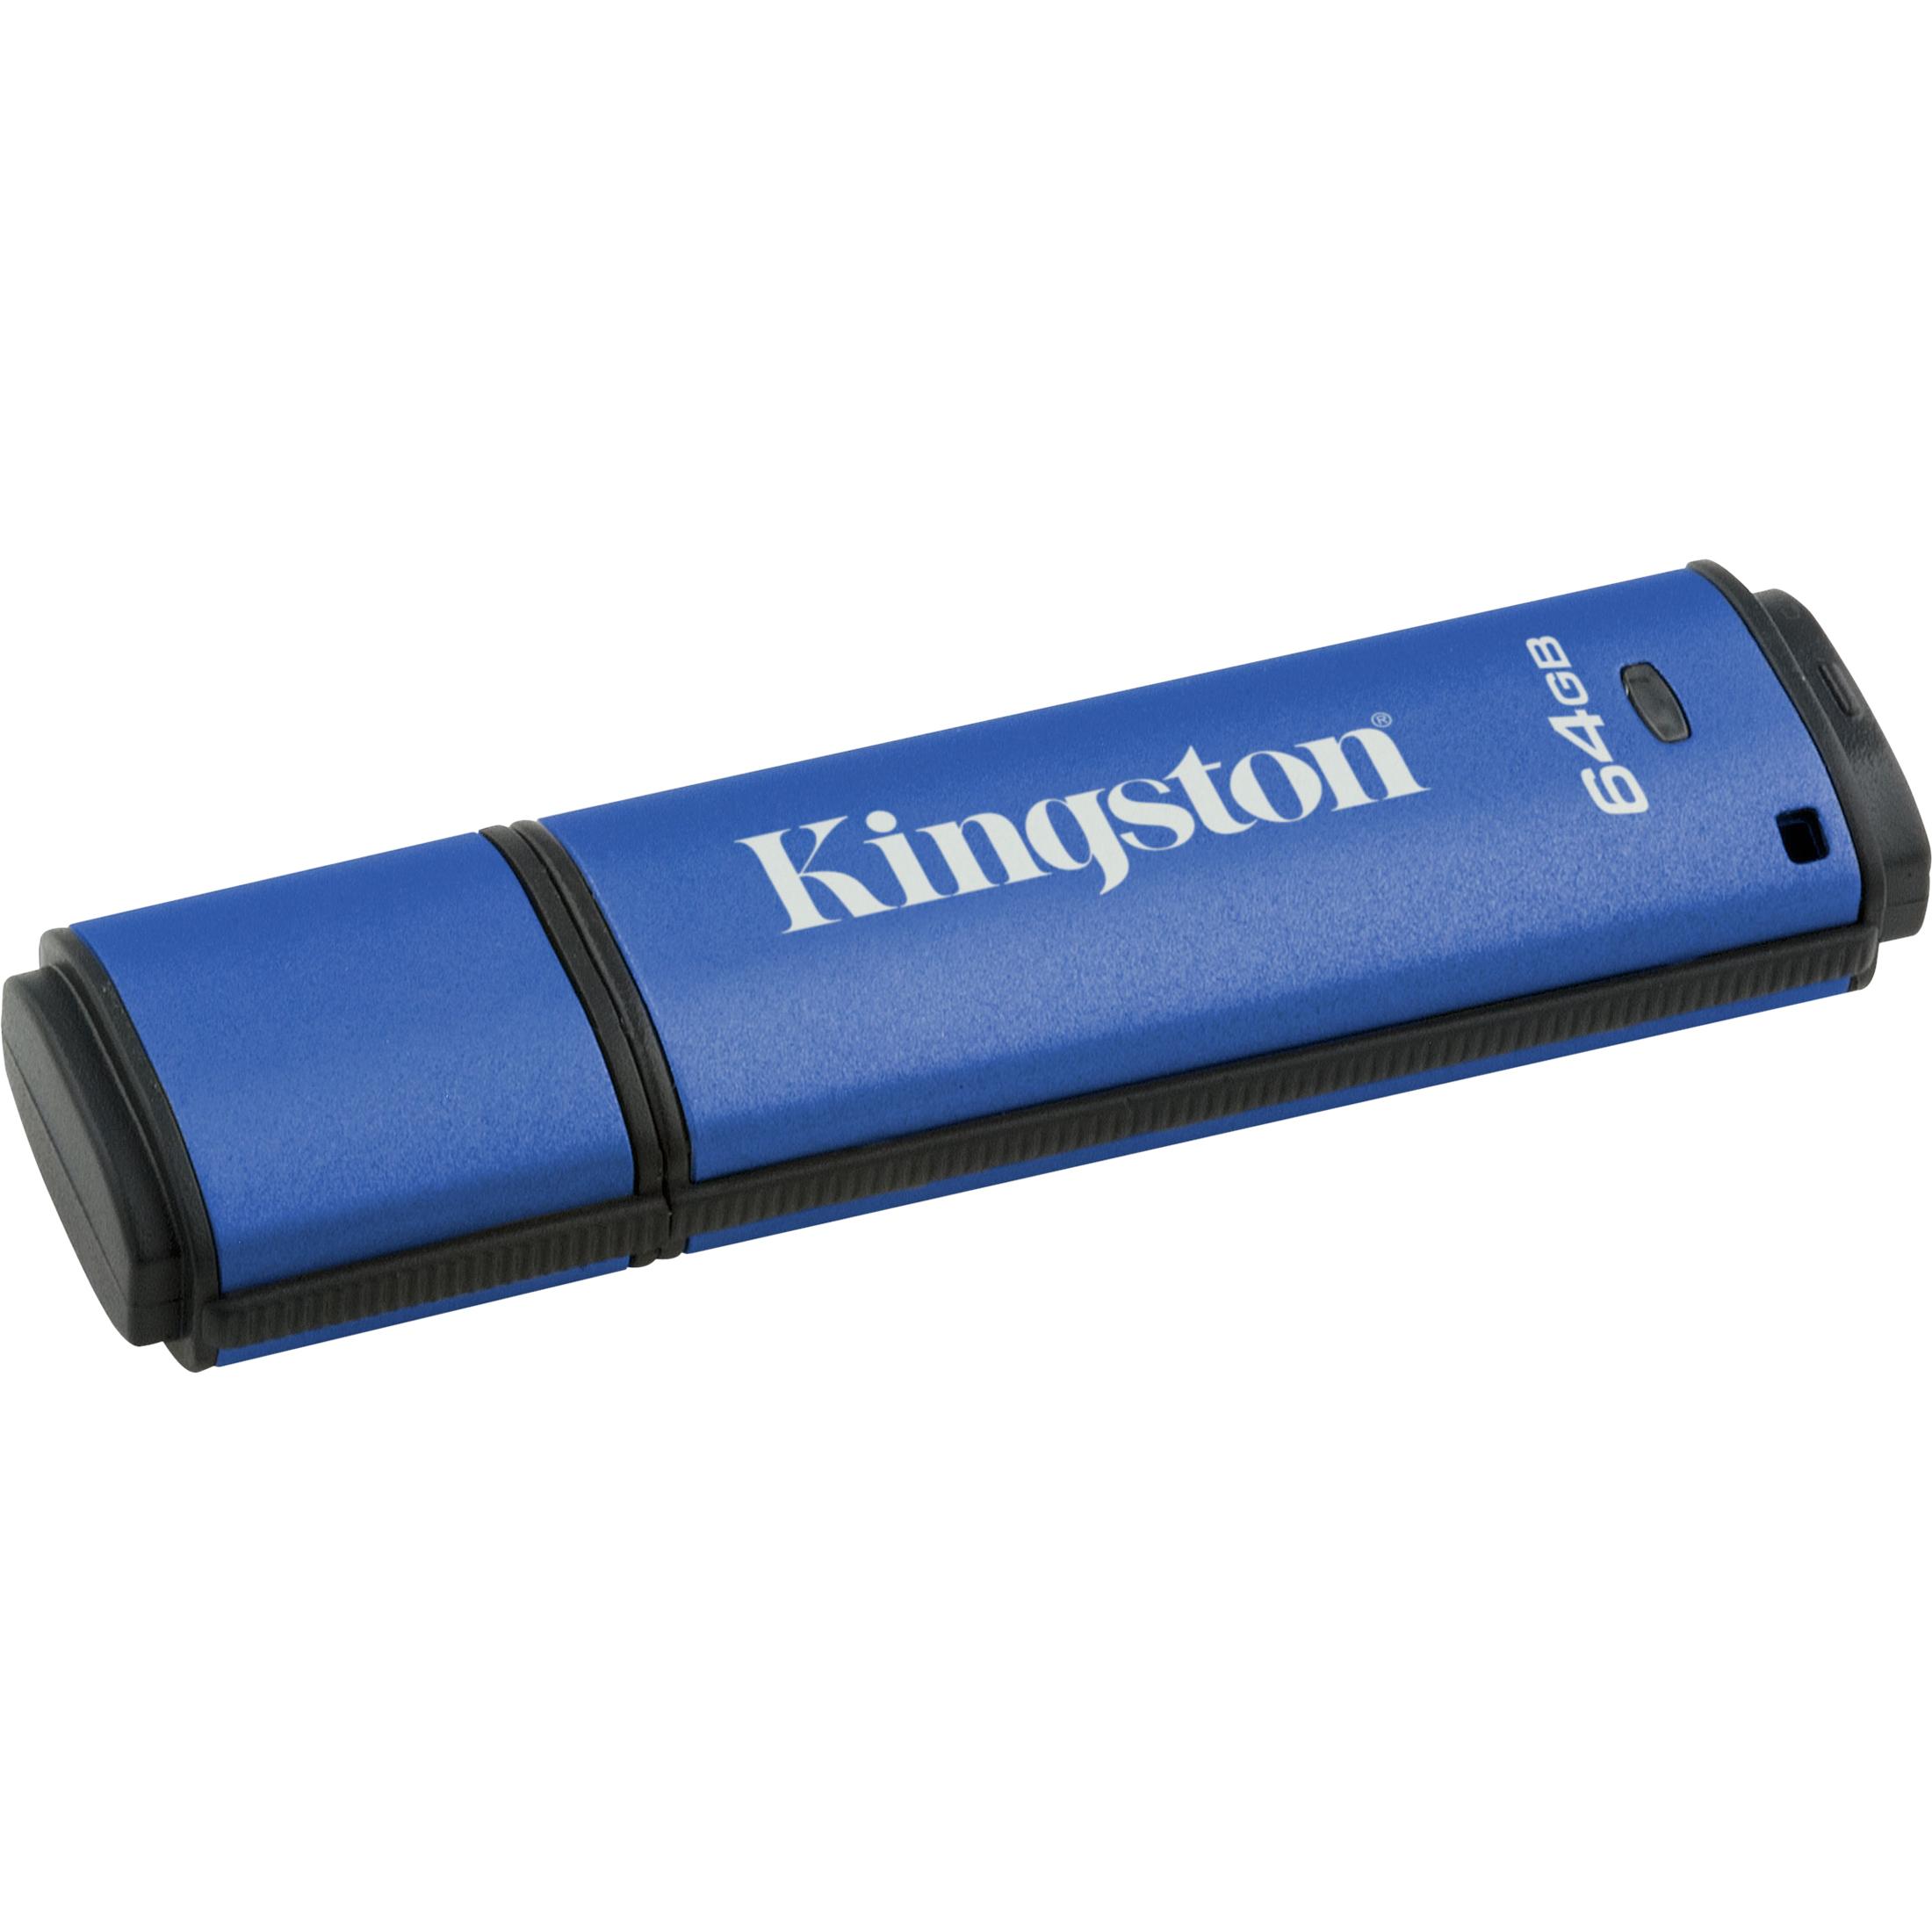 Kingston DataTraveler Vault 64 GB USB 3.0 Flash Drive